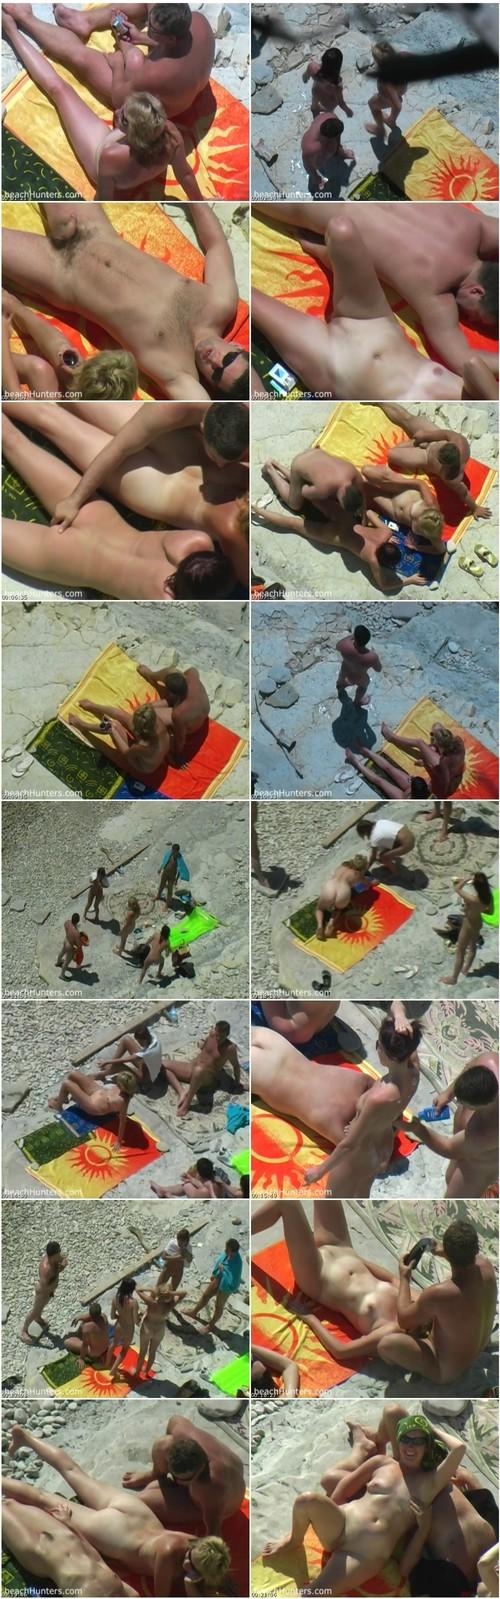 beachhunters0167_thumb_m.jpg